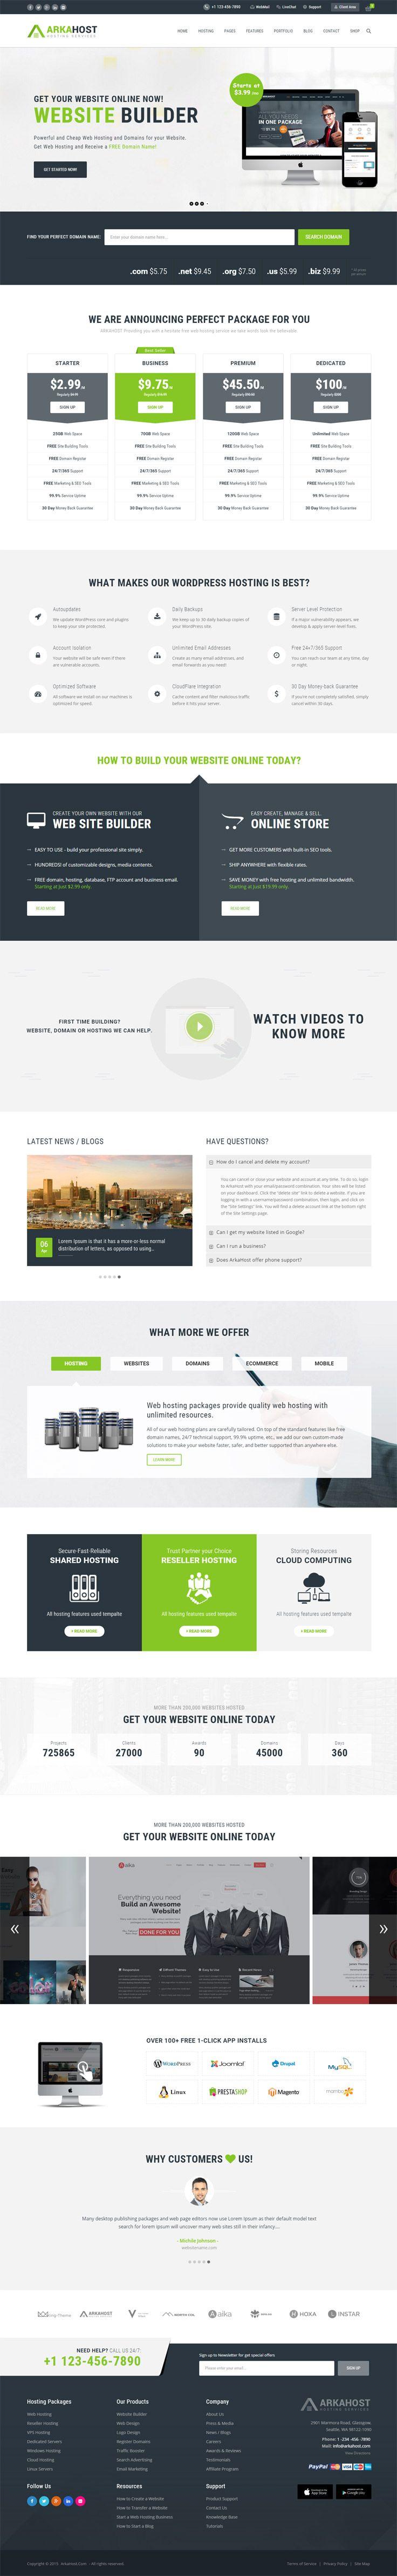 10 + Superb Premium WordPress Technology Themes